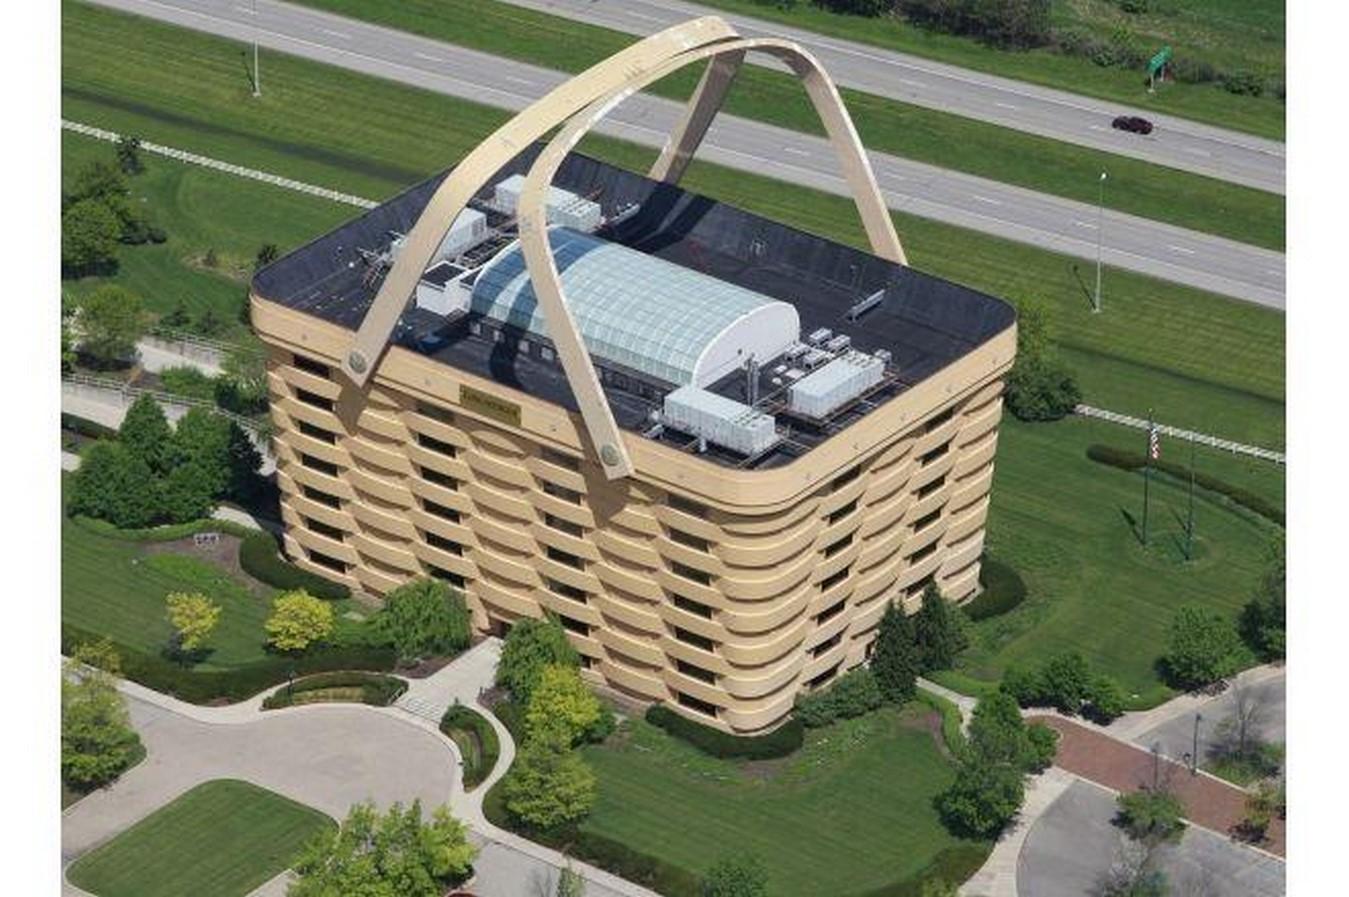 Longaberger Basket Building by NBBJ and Korda Nemeth Engineering: Ohio town's civic pride - Sheet5